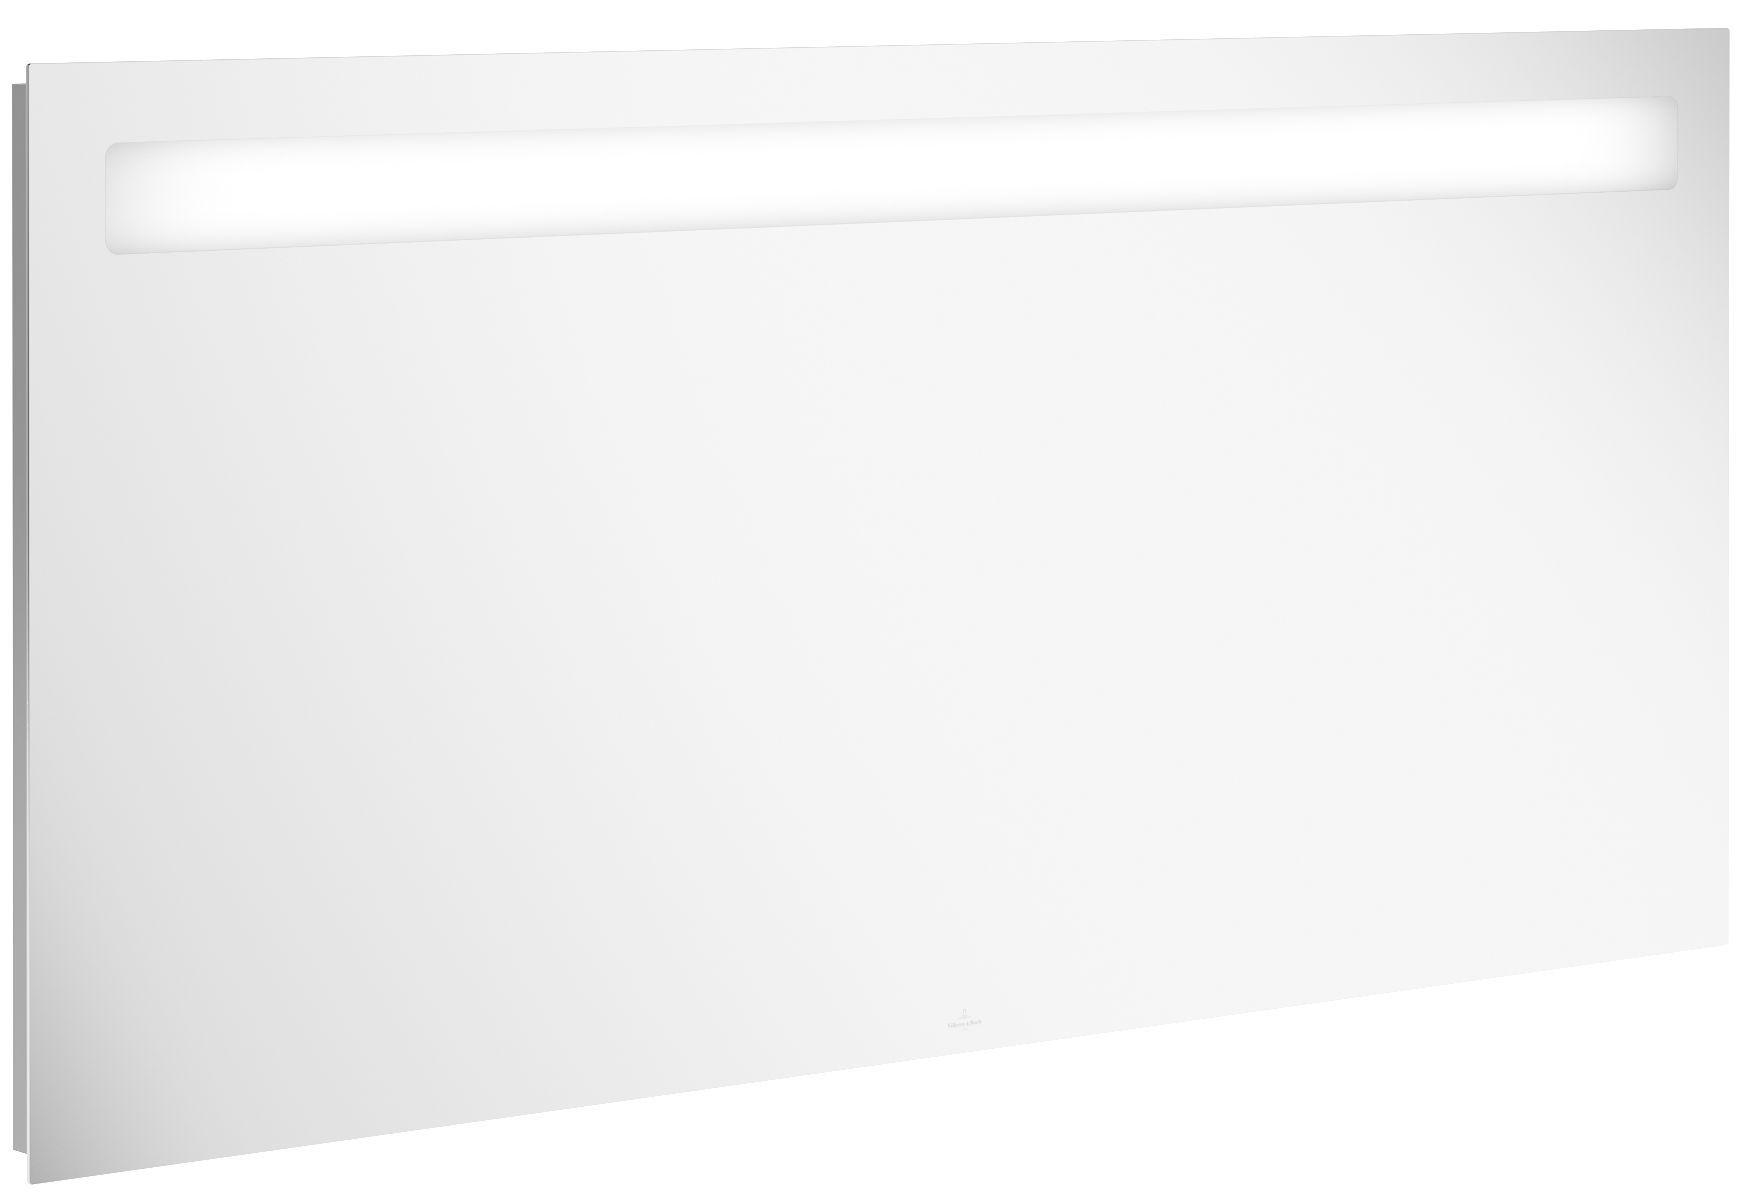 Villeroy & Boch More to See 14 Spiegel mit Beleuchtung  B:160xH:75xT:4,7cm A4321600